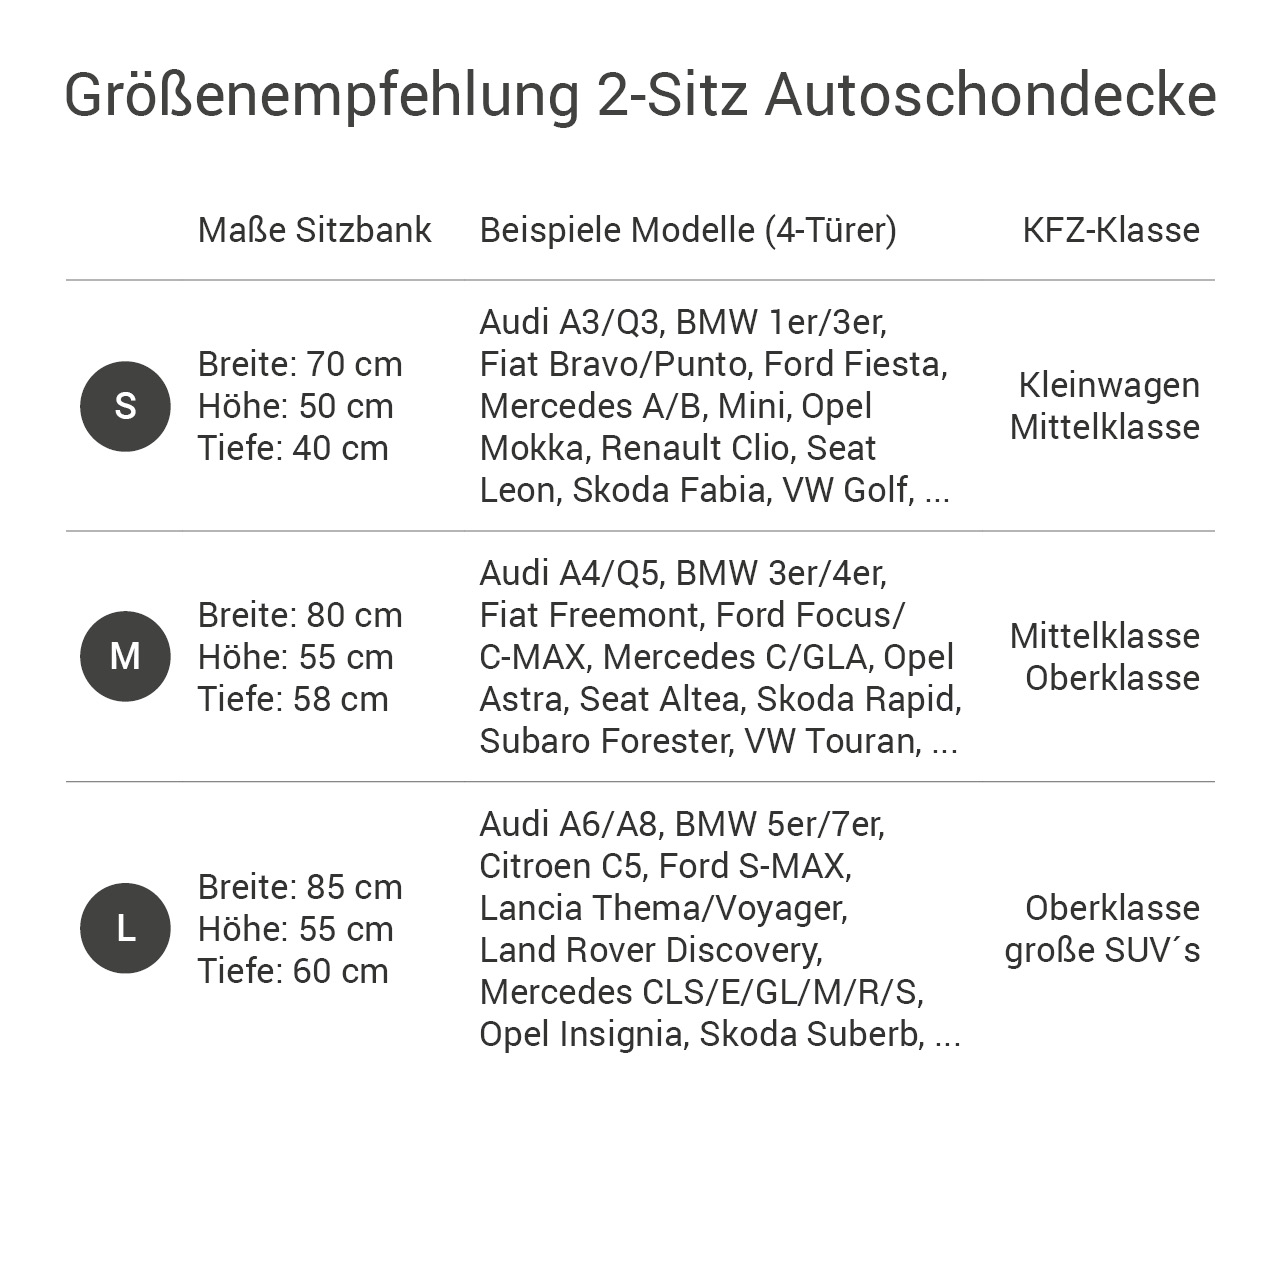 Doctor Bark - Autoschondecke für Hunde - Rückbank 2-Sitz Gr. M - schwarz